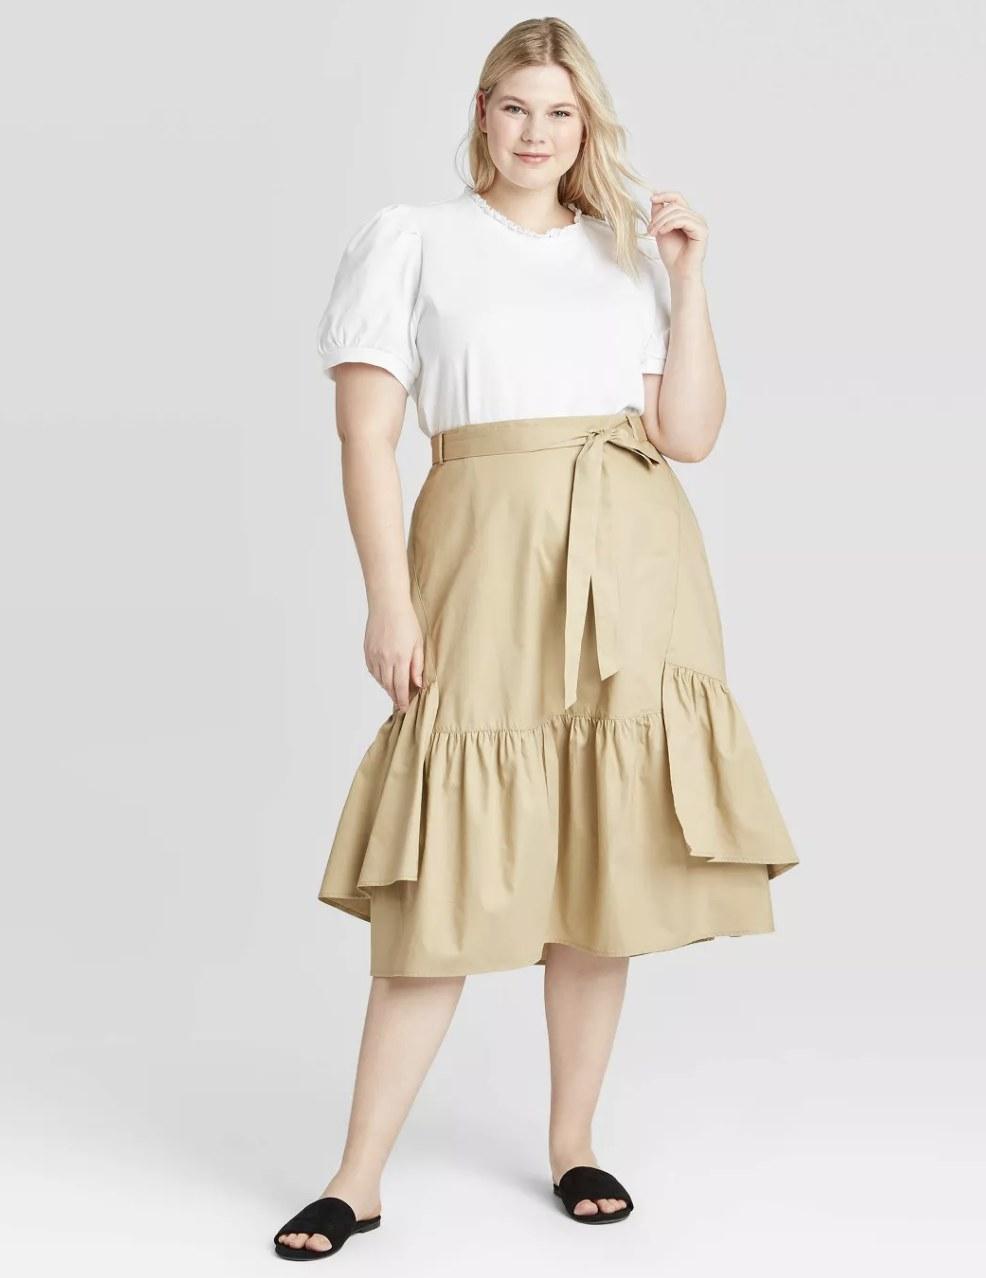 Model wearing the tan midi skirt with a ruffle hem